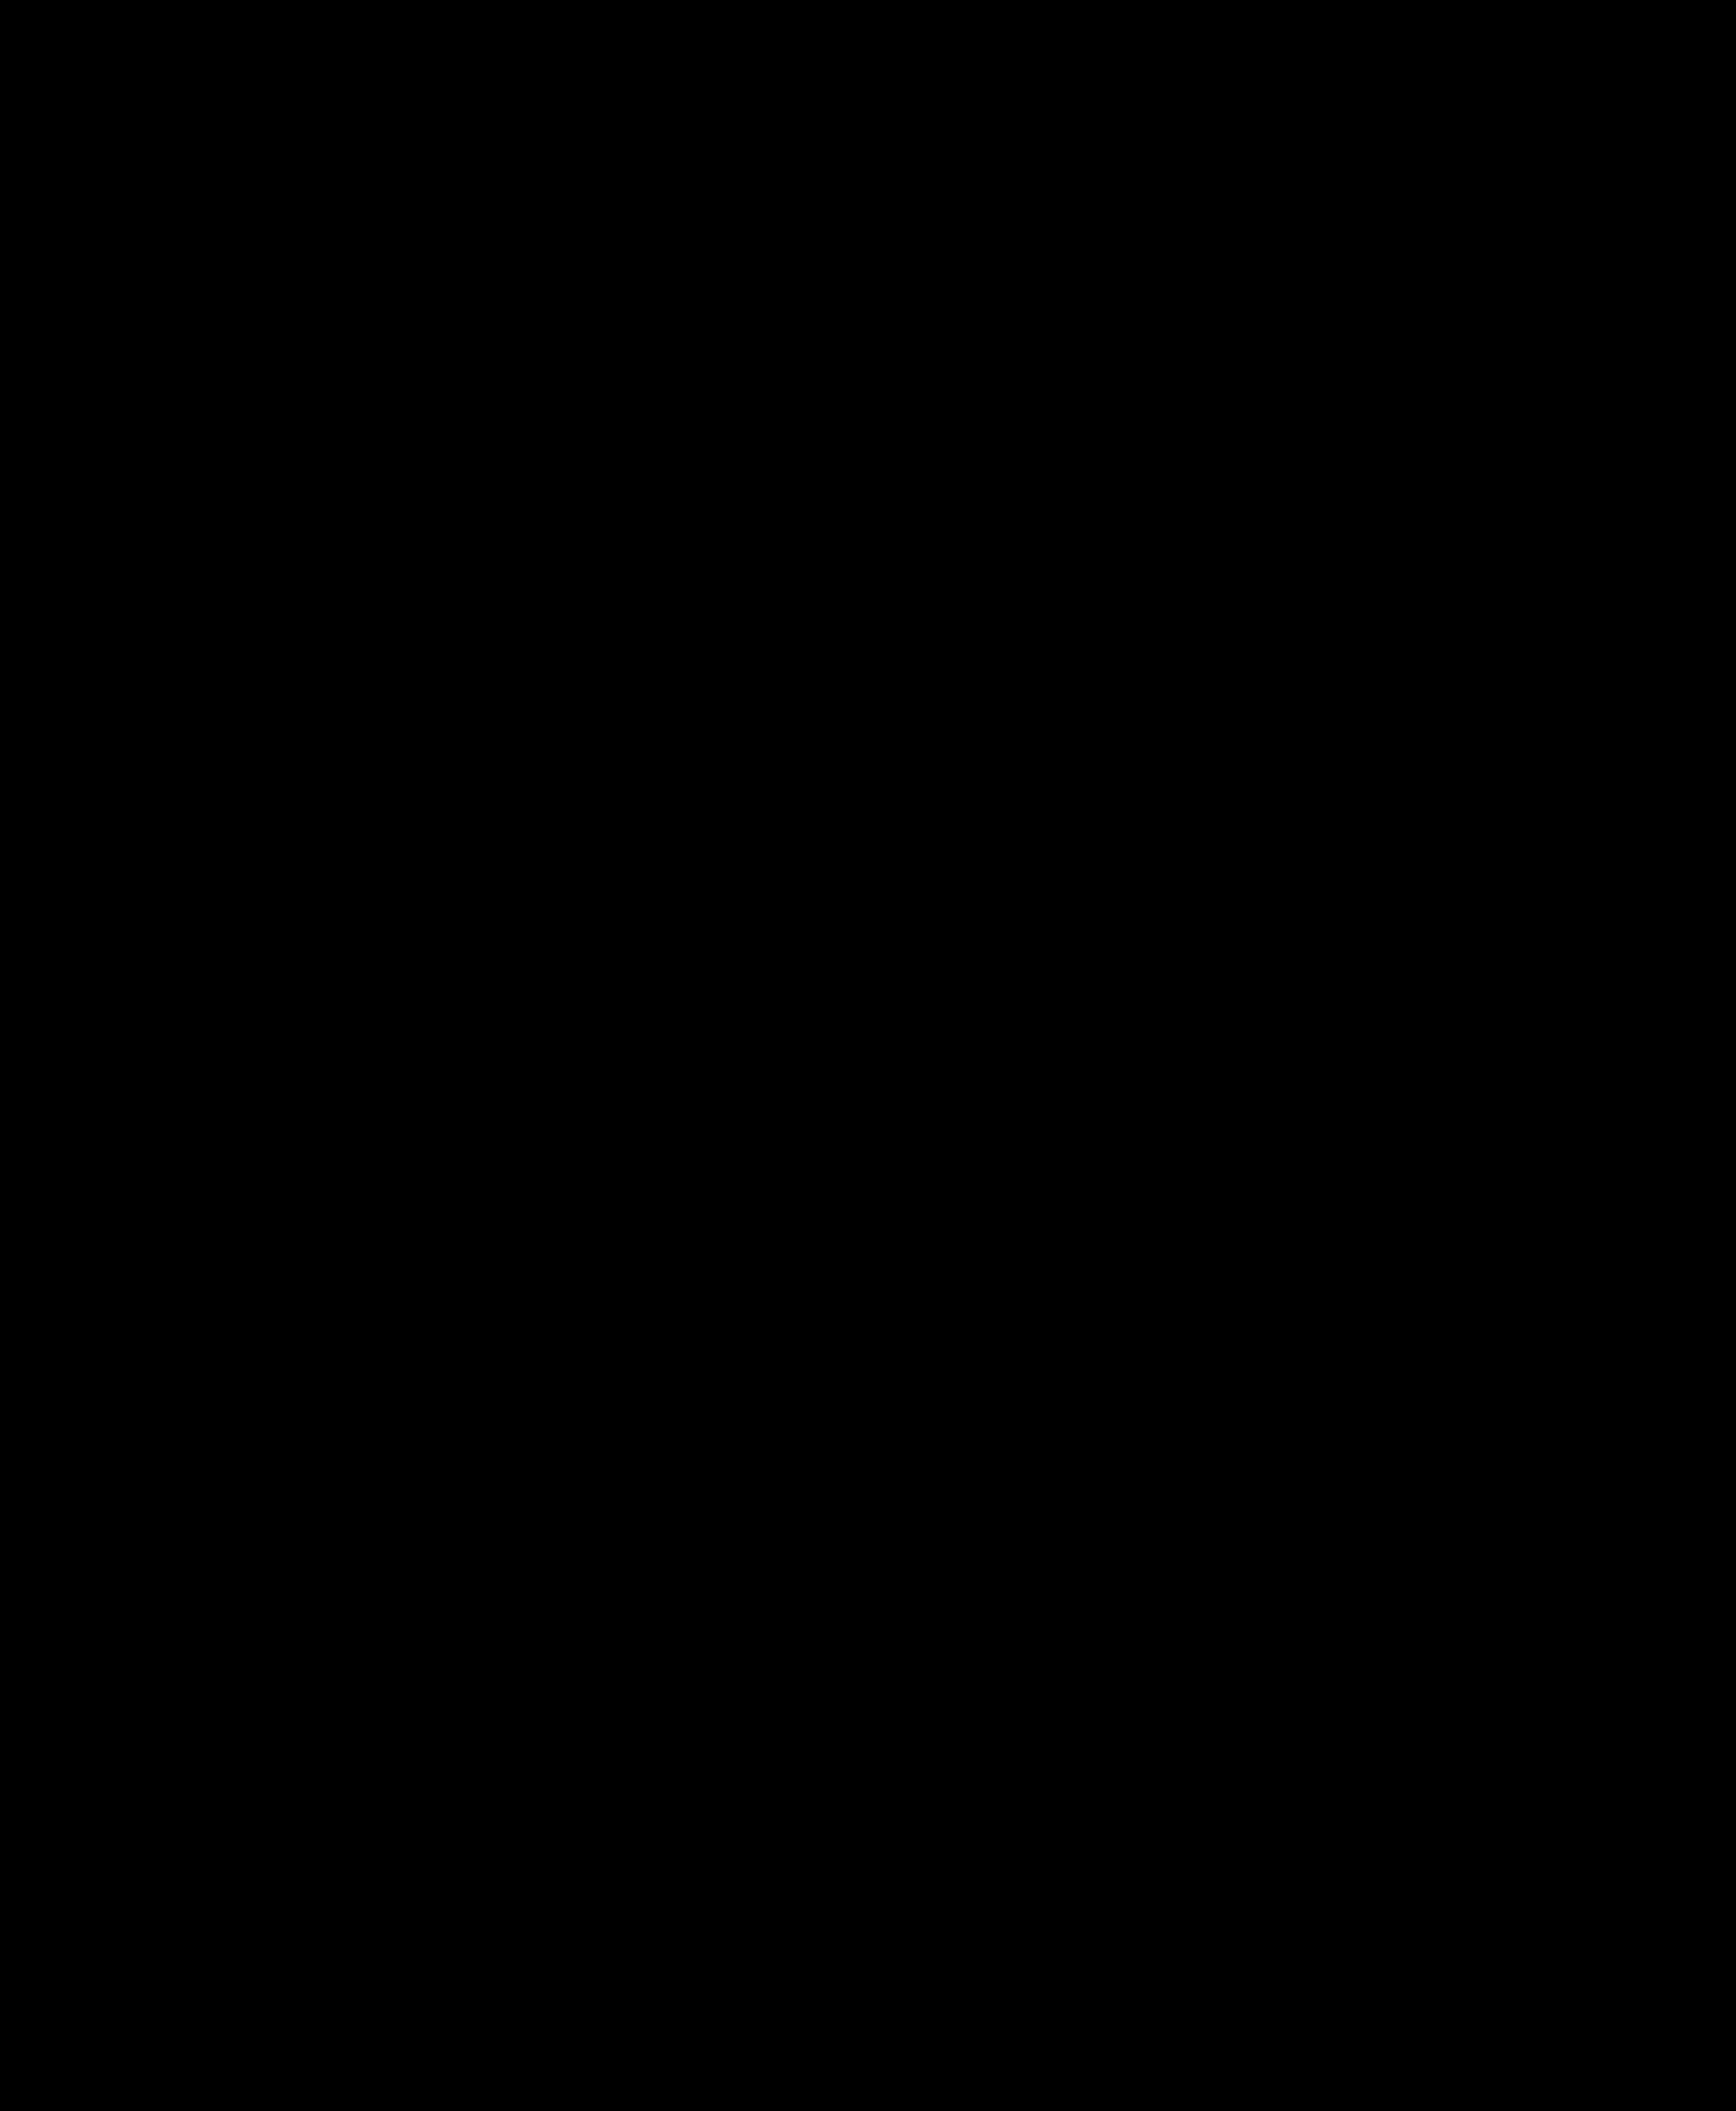 Byzantine cross clipart jpg transparent stock christianity symbol - Google Search | Tattoo | Pinterest | Christians jpg transparent stock